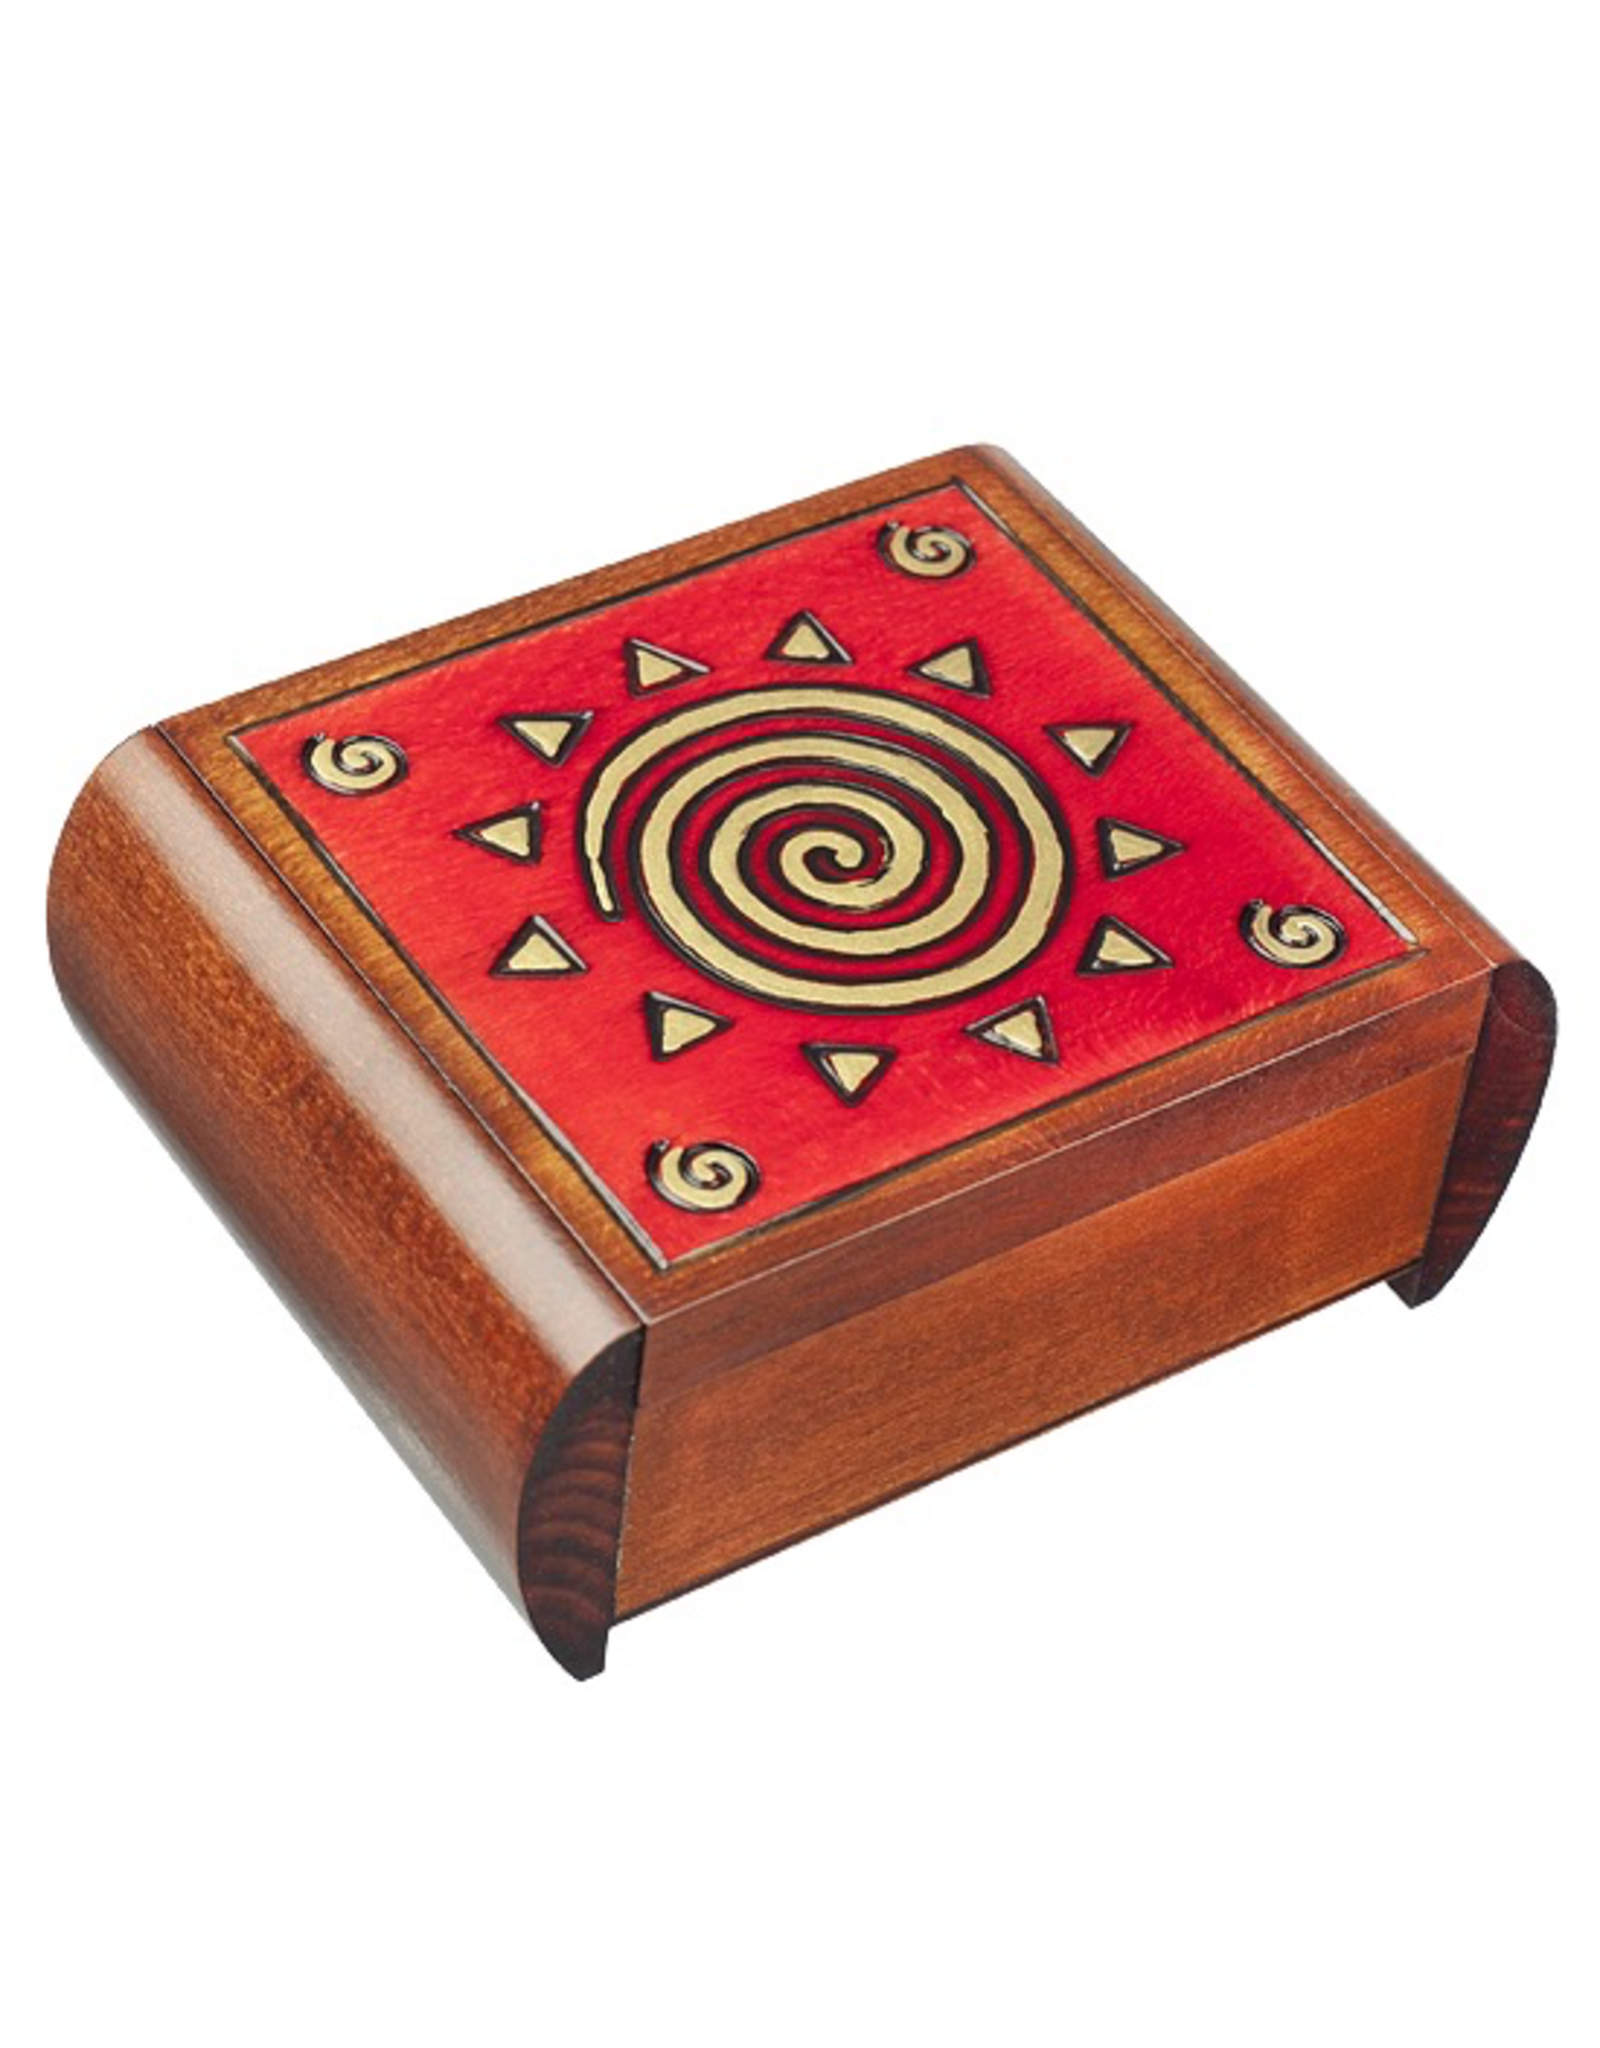 Enchanted Boxes Atlantis Secret Wood Box